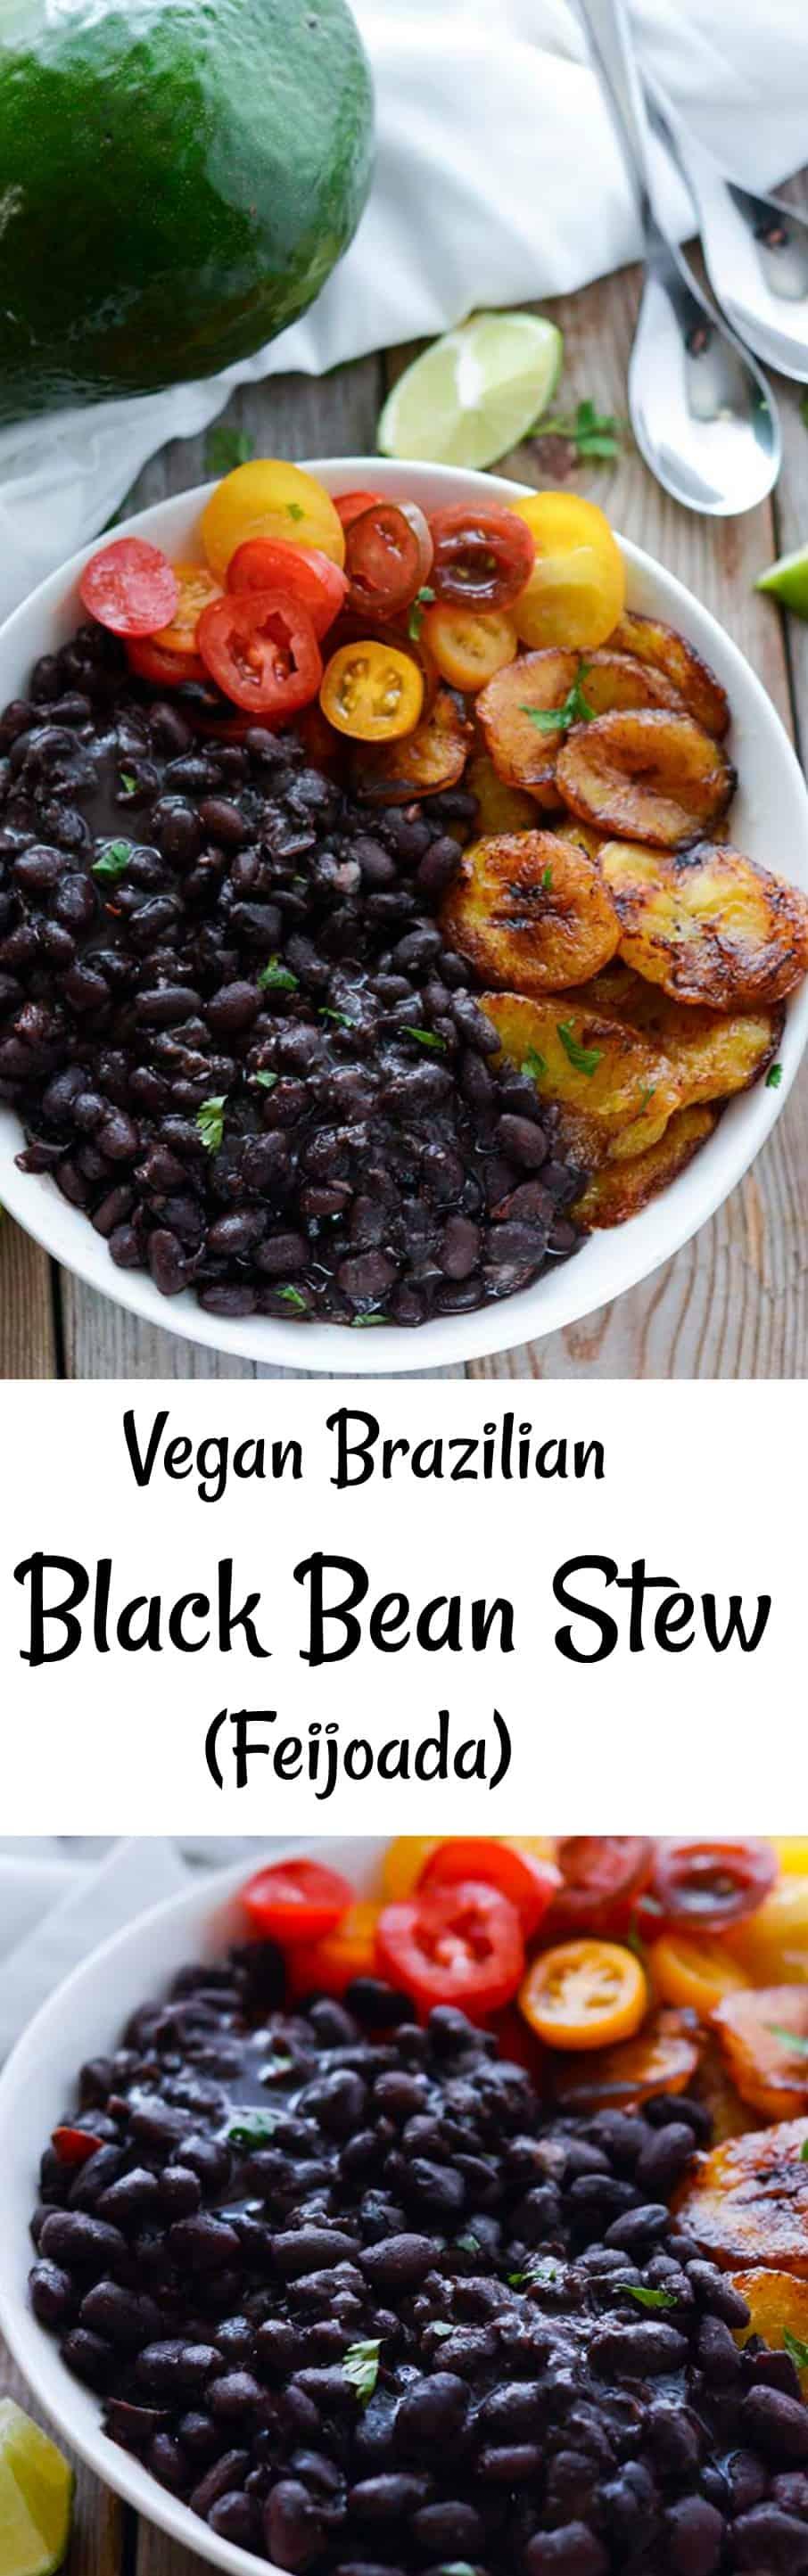 http://healthiersteps.com/recipe/vegan-brazilian-black-bean-stew-feijoada/